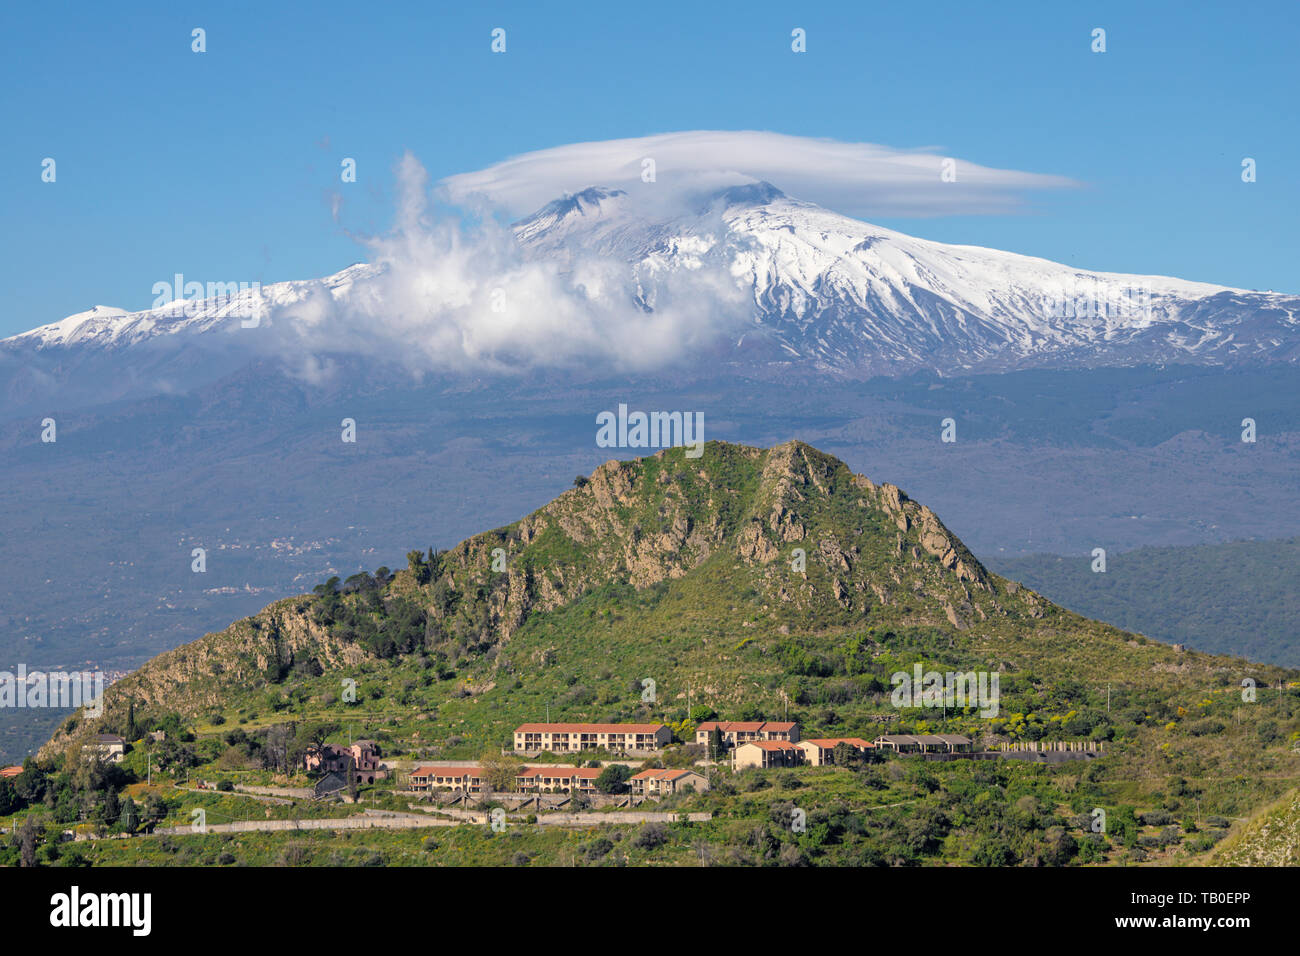 Taormina - The Mt. Etna volcano over the Sicilian landscape. - Stock Image